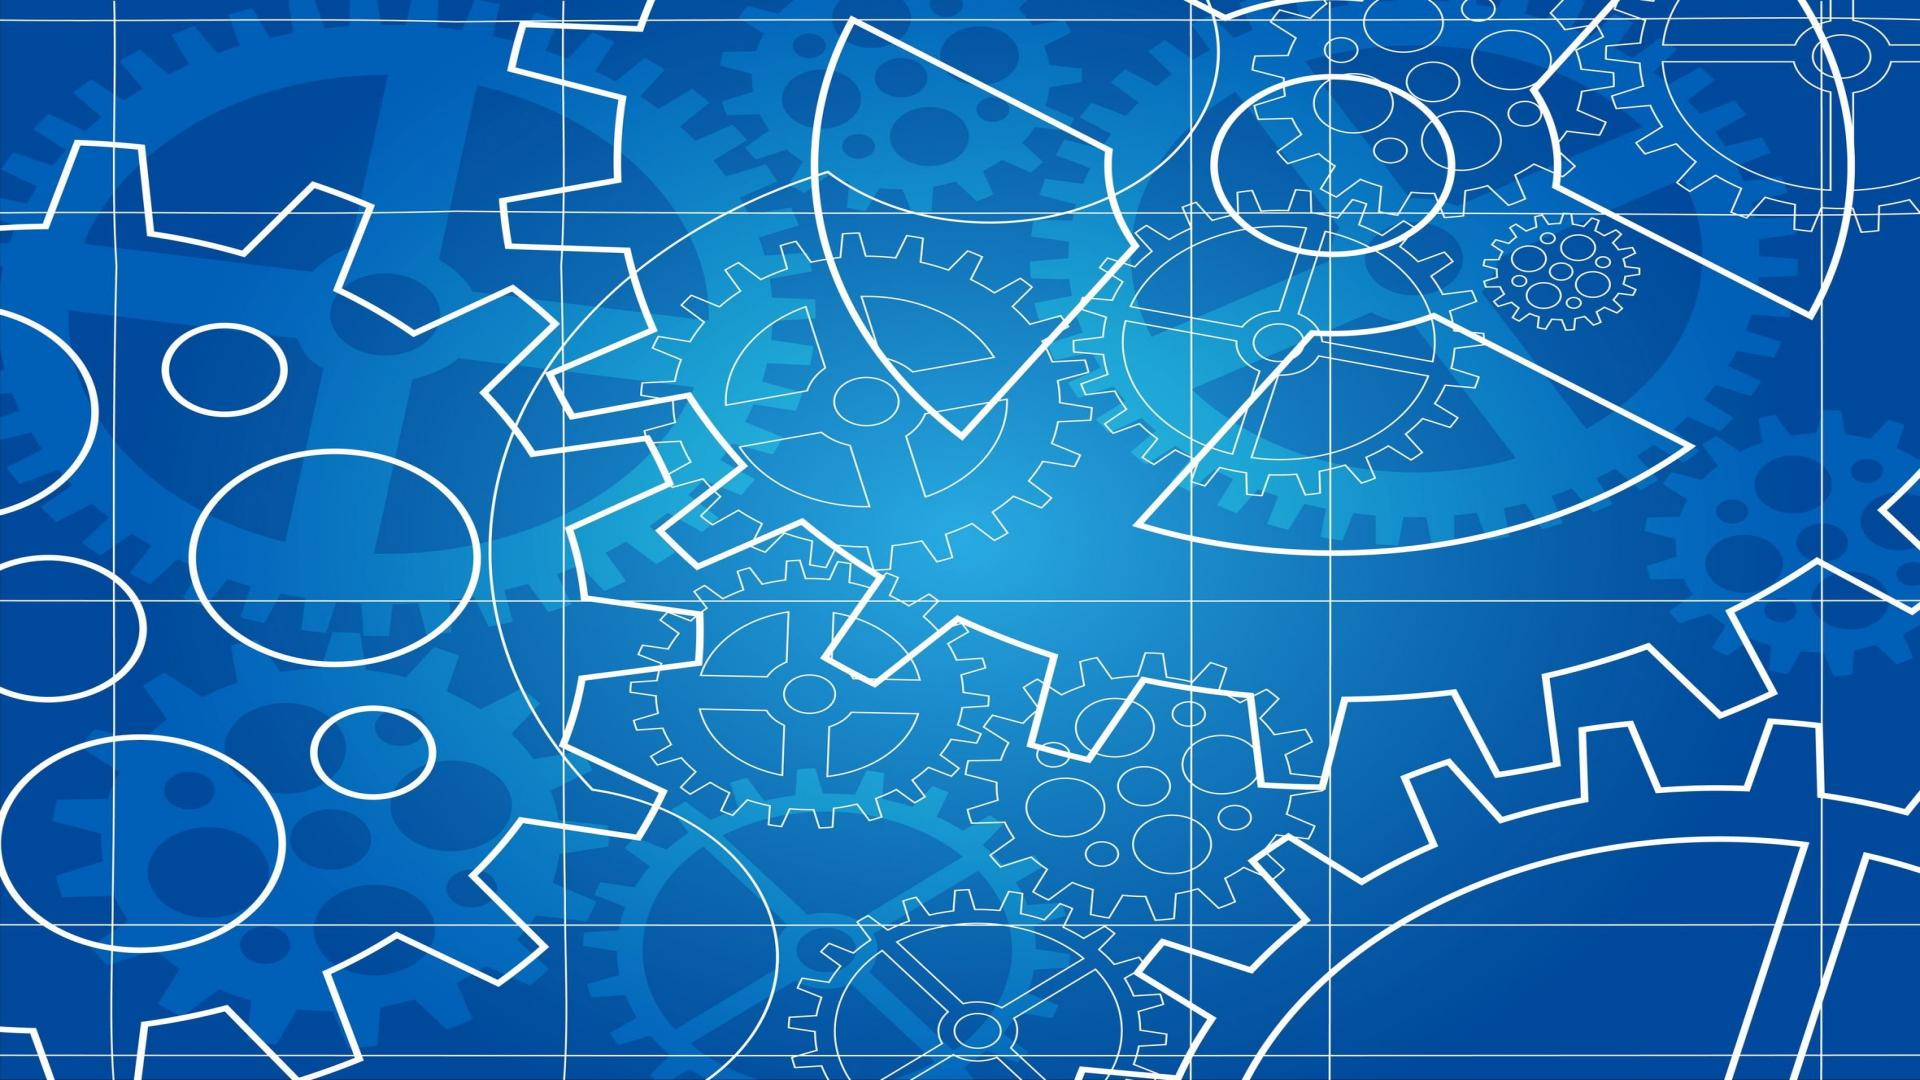 Civil Engineering Quotes Wallpapers Gear Wallpaper Hd Pixelstalk Net